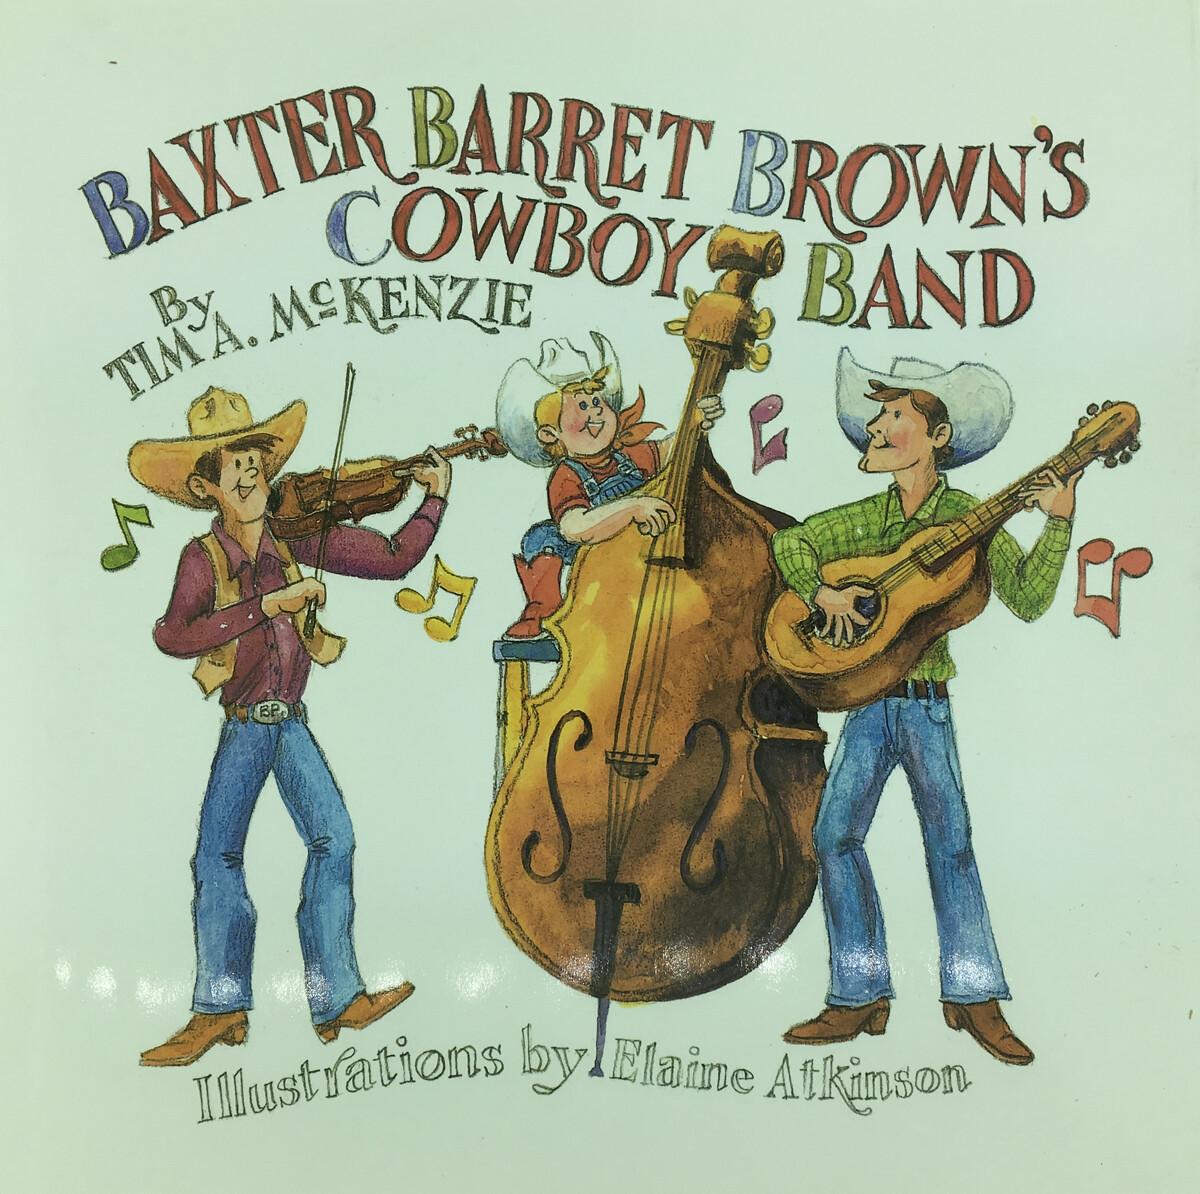 Baxter Barret Brown's Cowboy Band